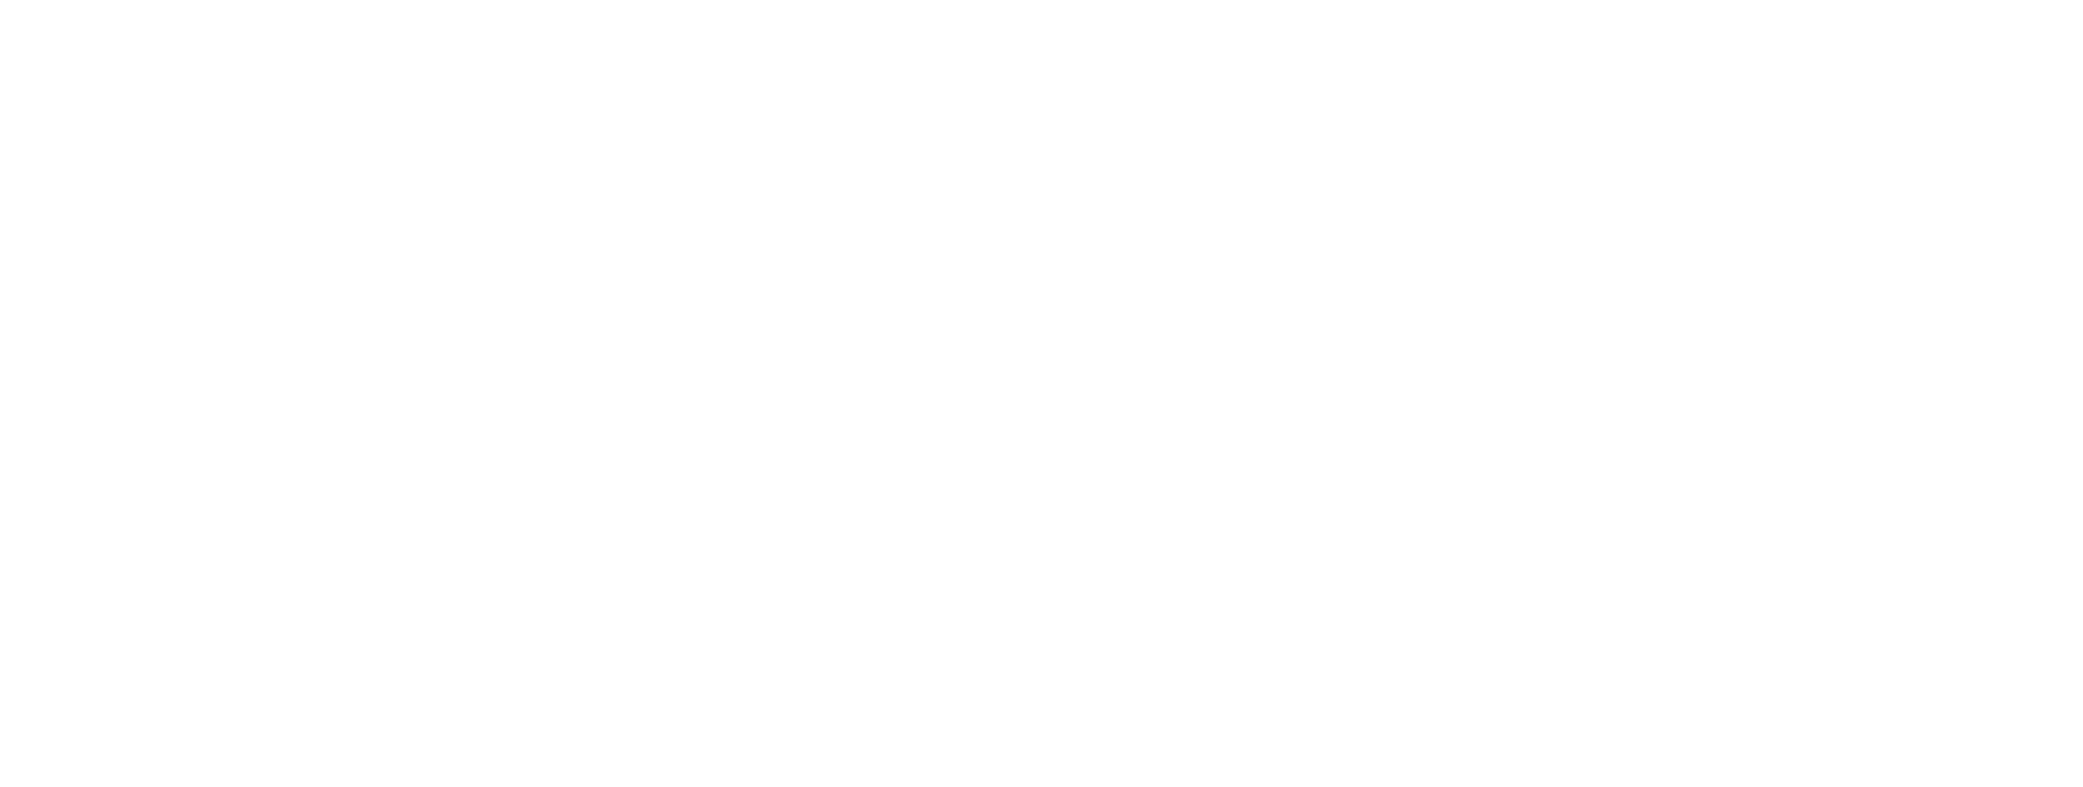 Peter Hinssen Books